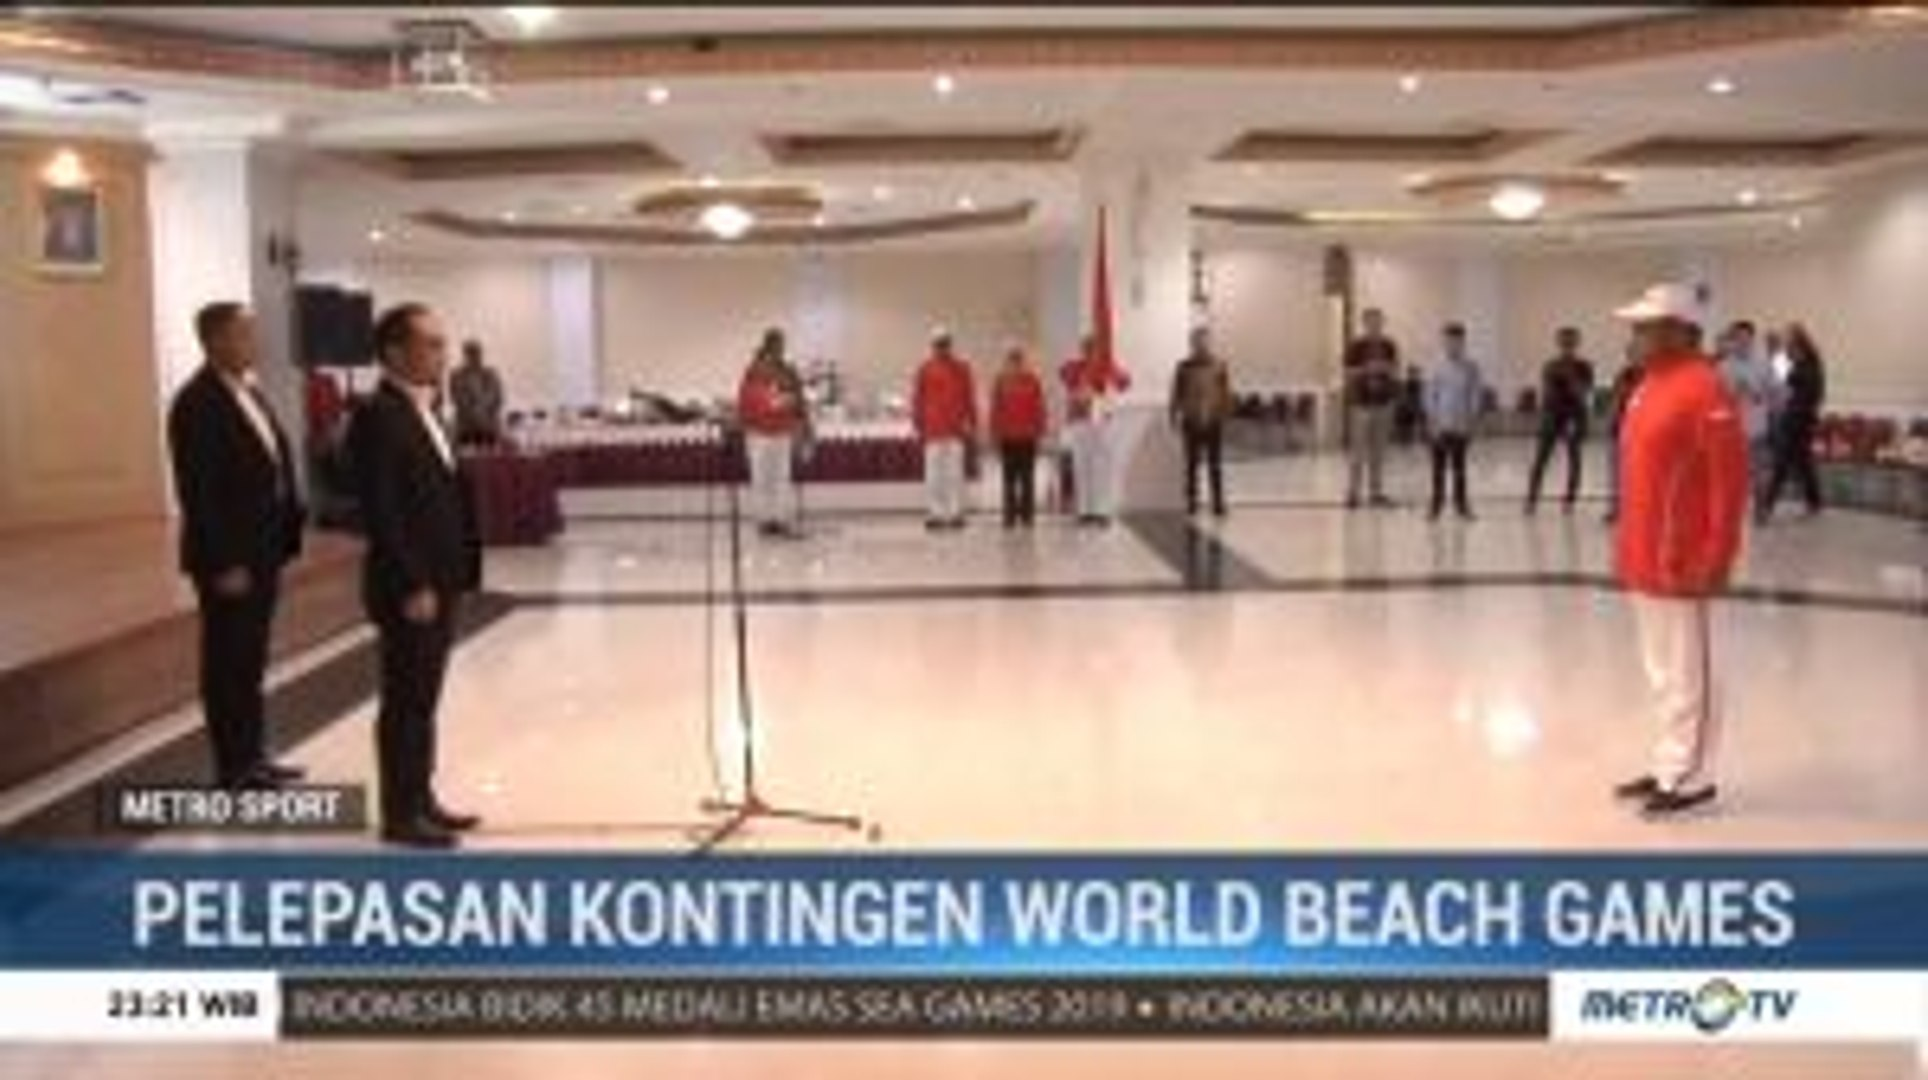 Pelepasan Kontingen World Beach Games Qatar